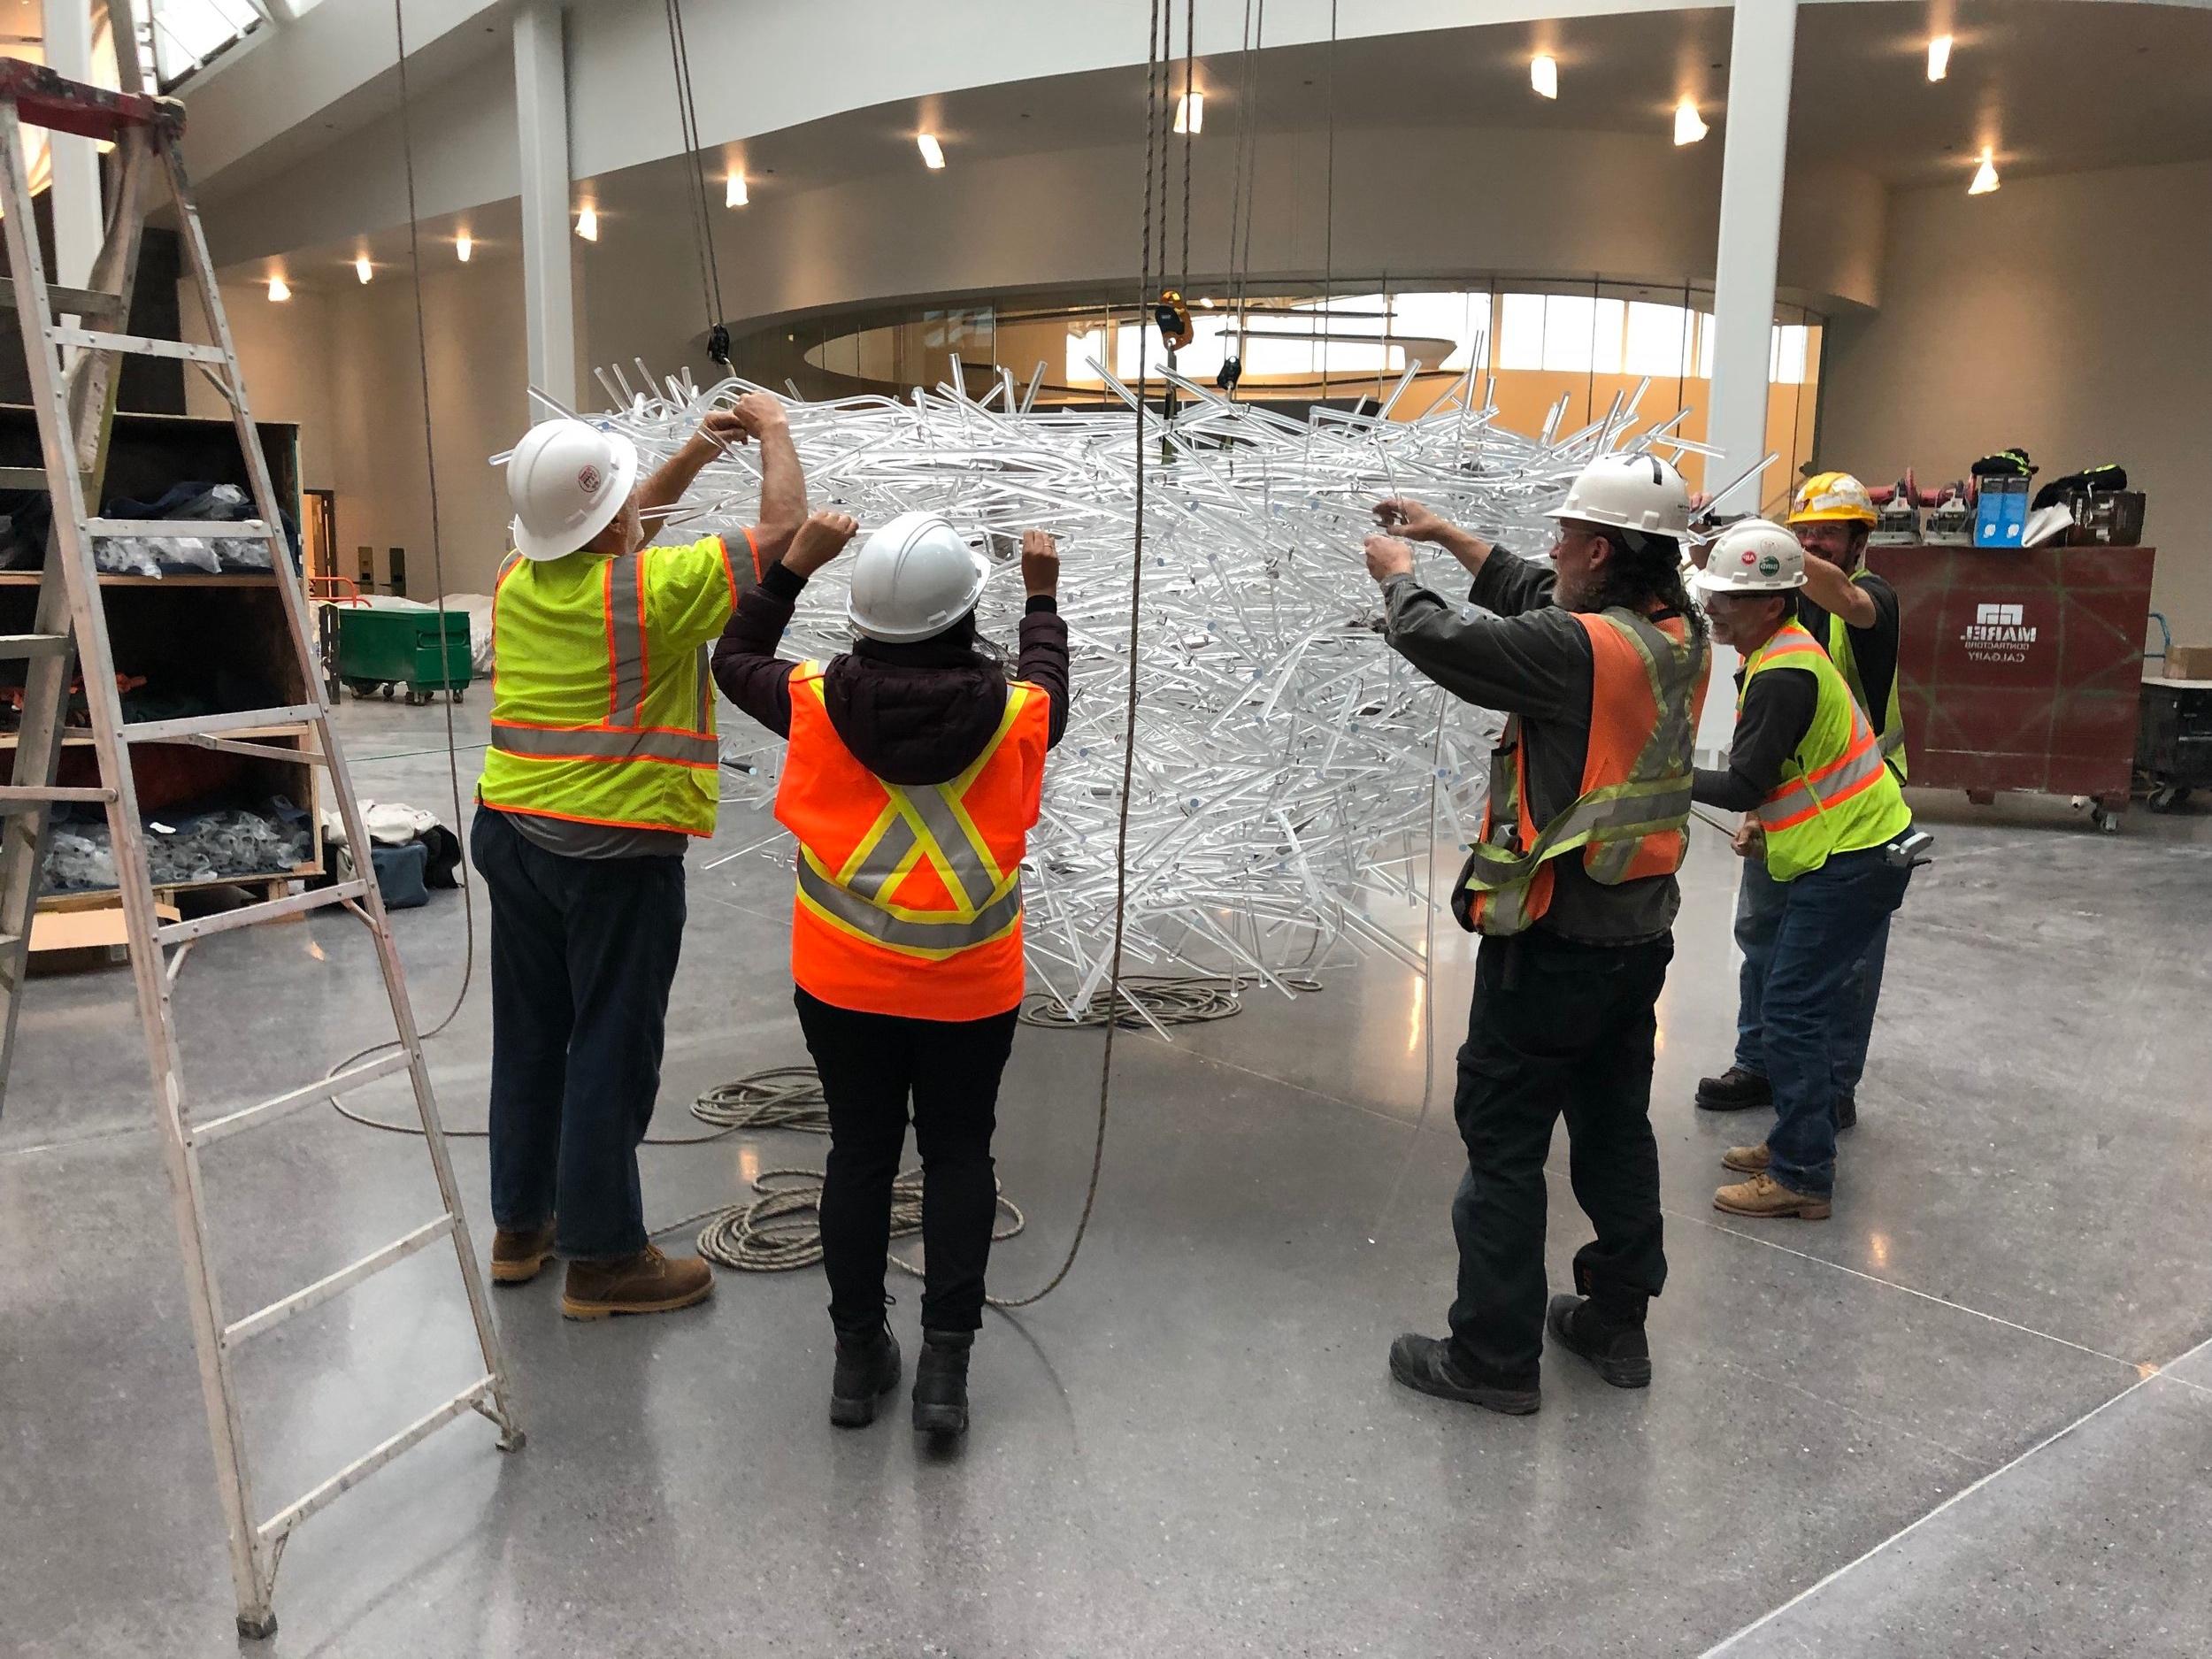 Calgary_The Nest_Donald Lipski_Public Art Services_J Grant Projects_24.jpg